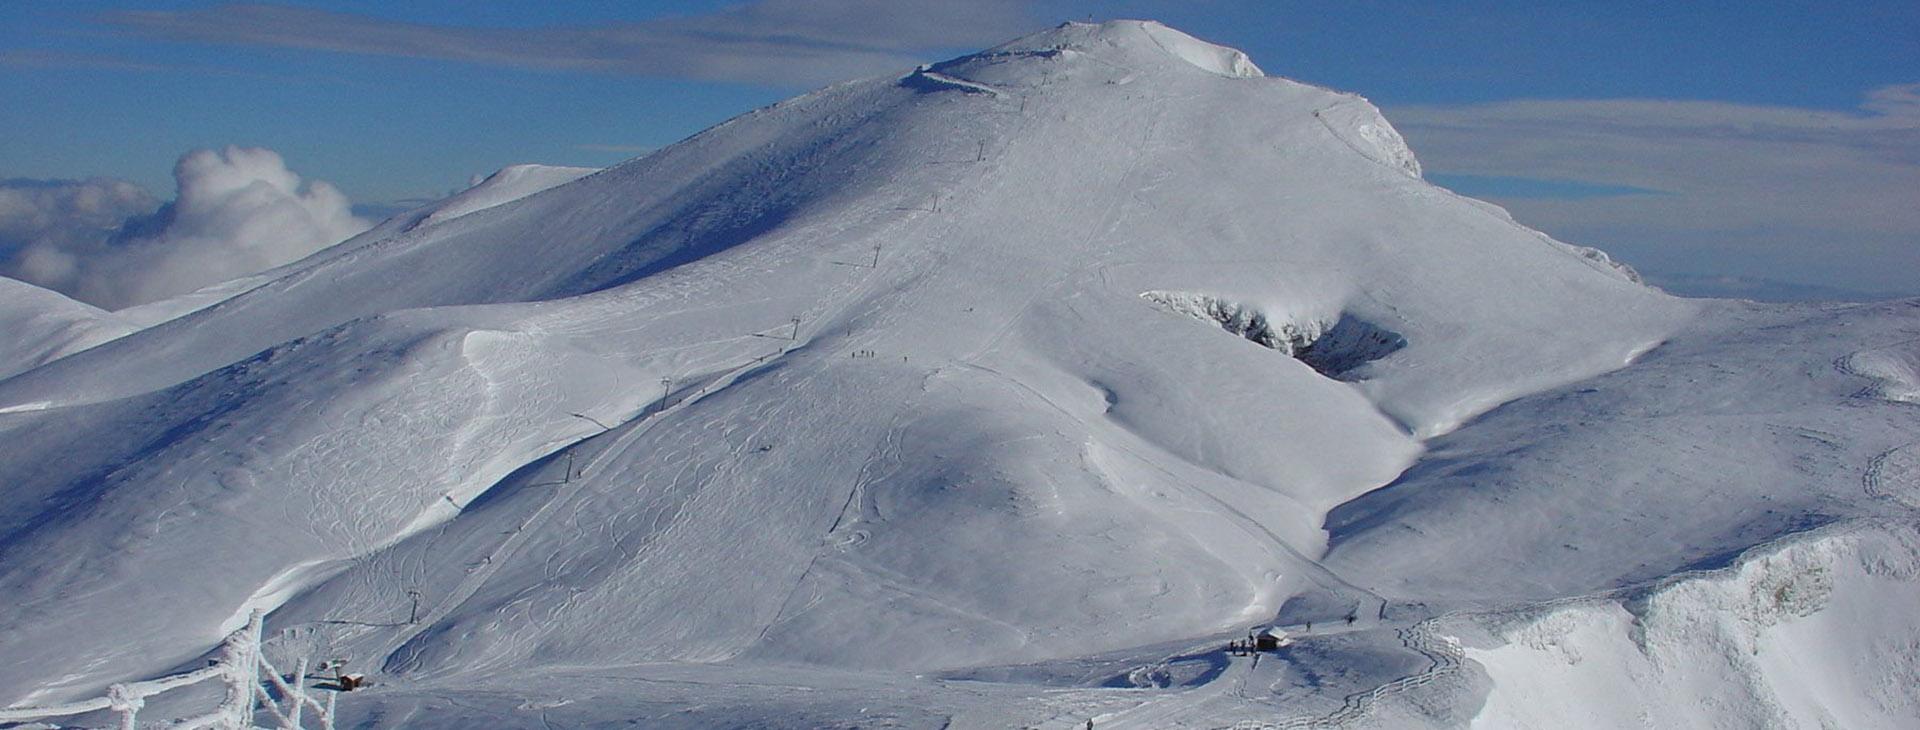 Falakro Ski Center, Mt. Falakro, Drama